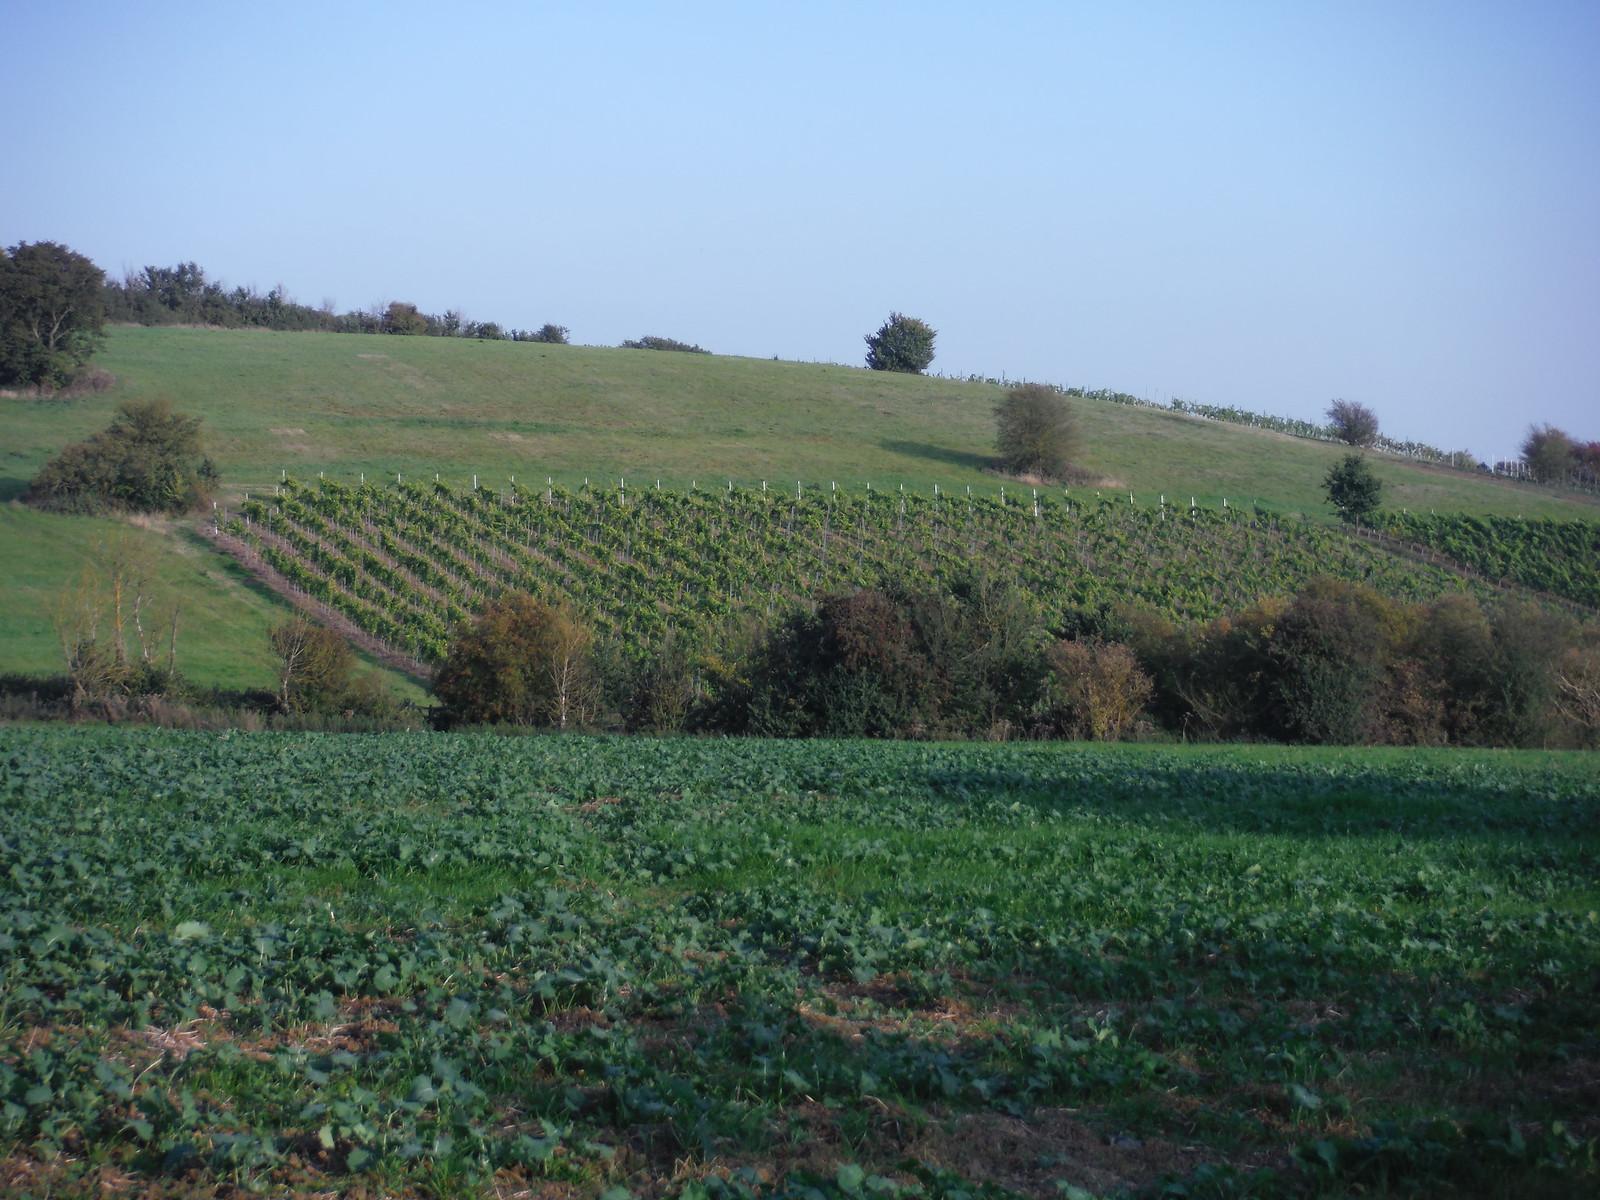 Vineyard, near Hawe's Wood SWC Walk 159 South Woodham Ferrers to North Fambridge